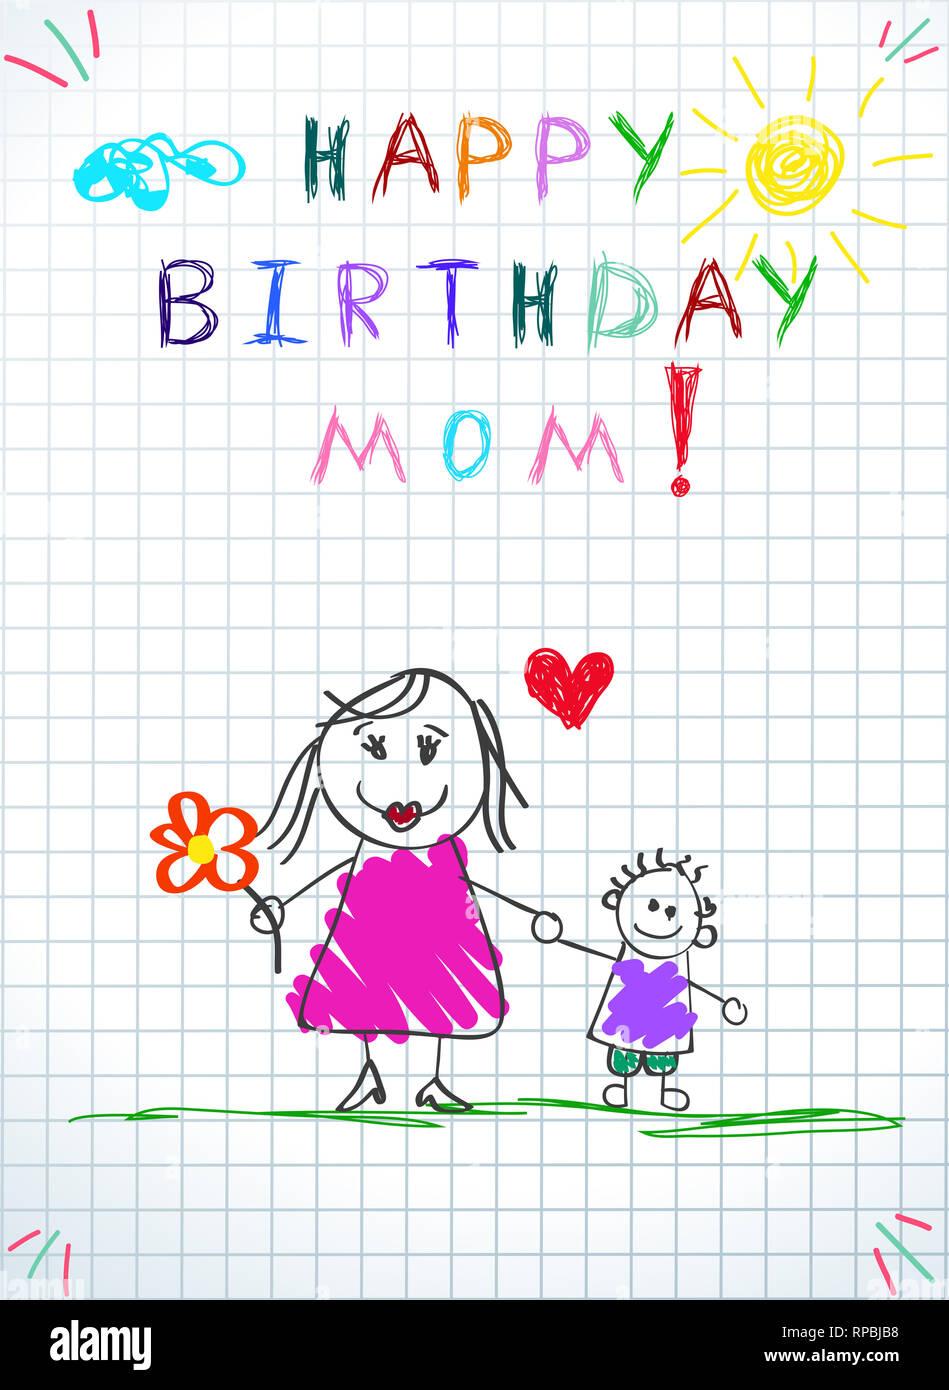 Happy Birthday Mom  Children Colorful Hand Drawn